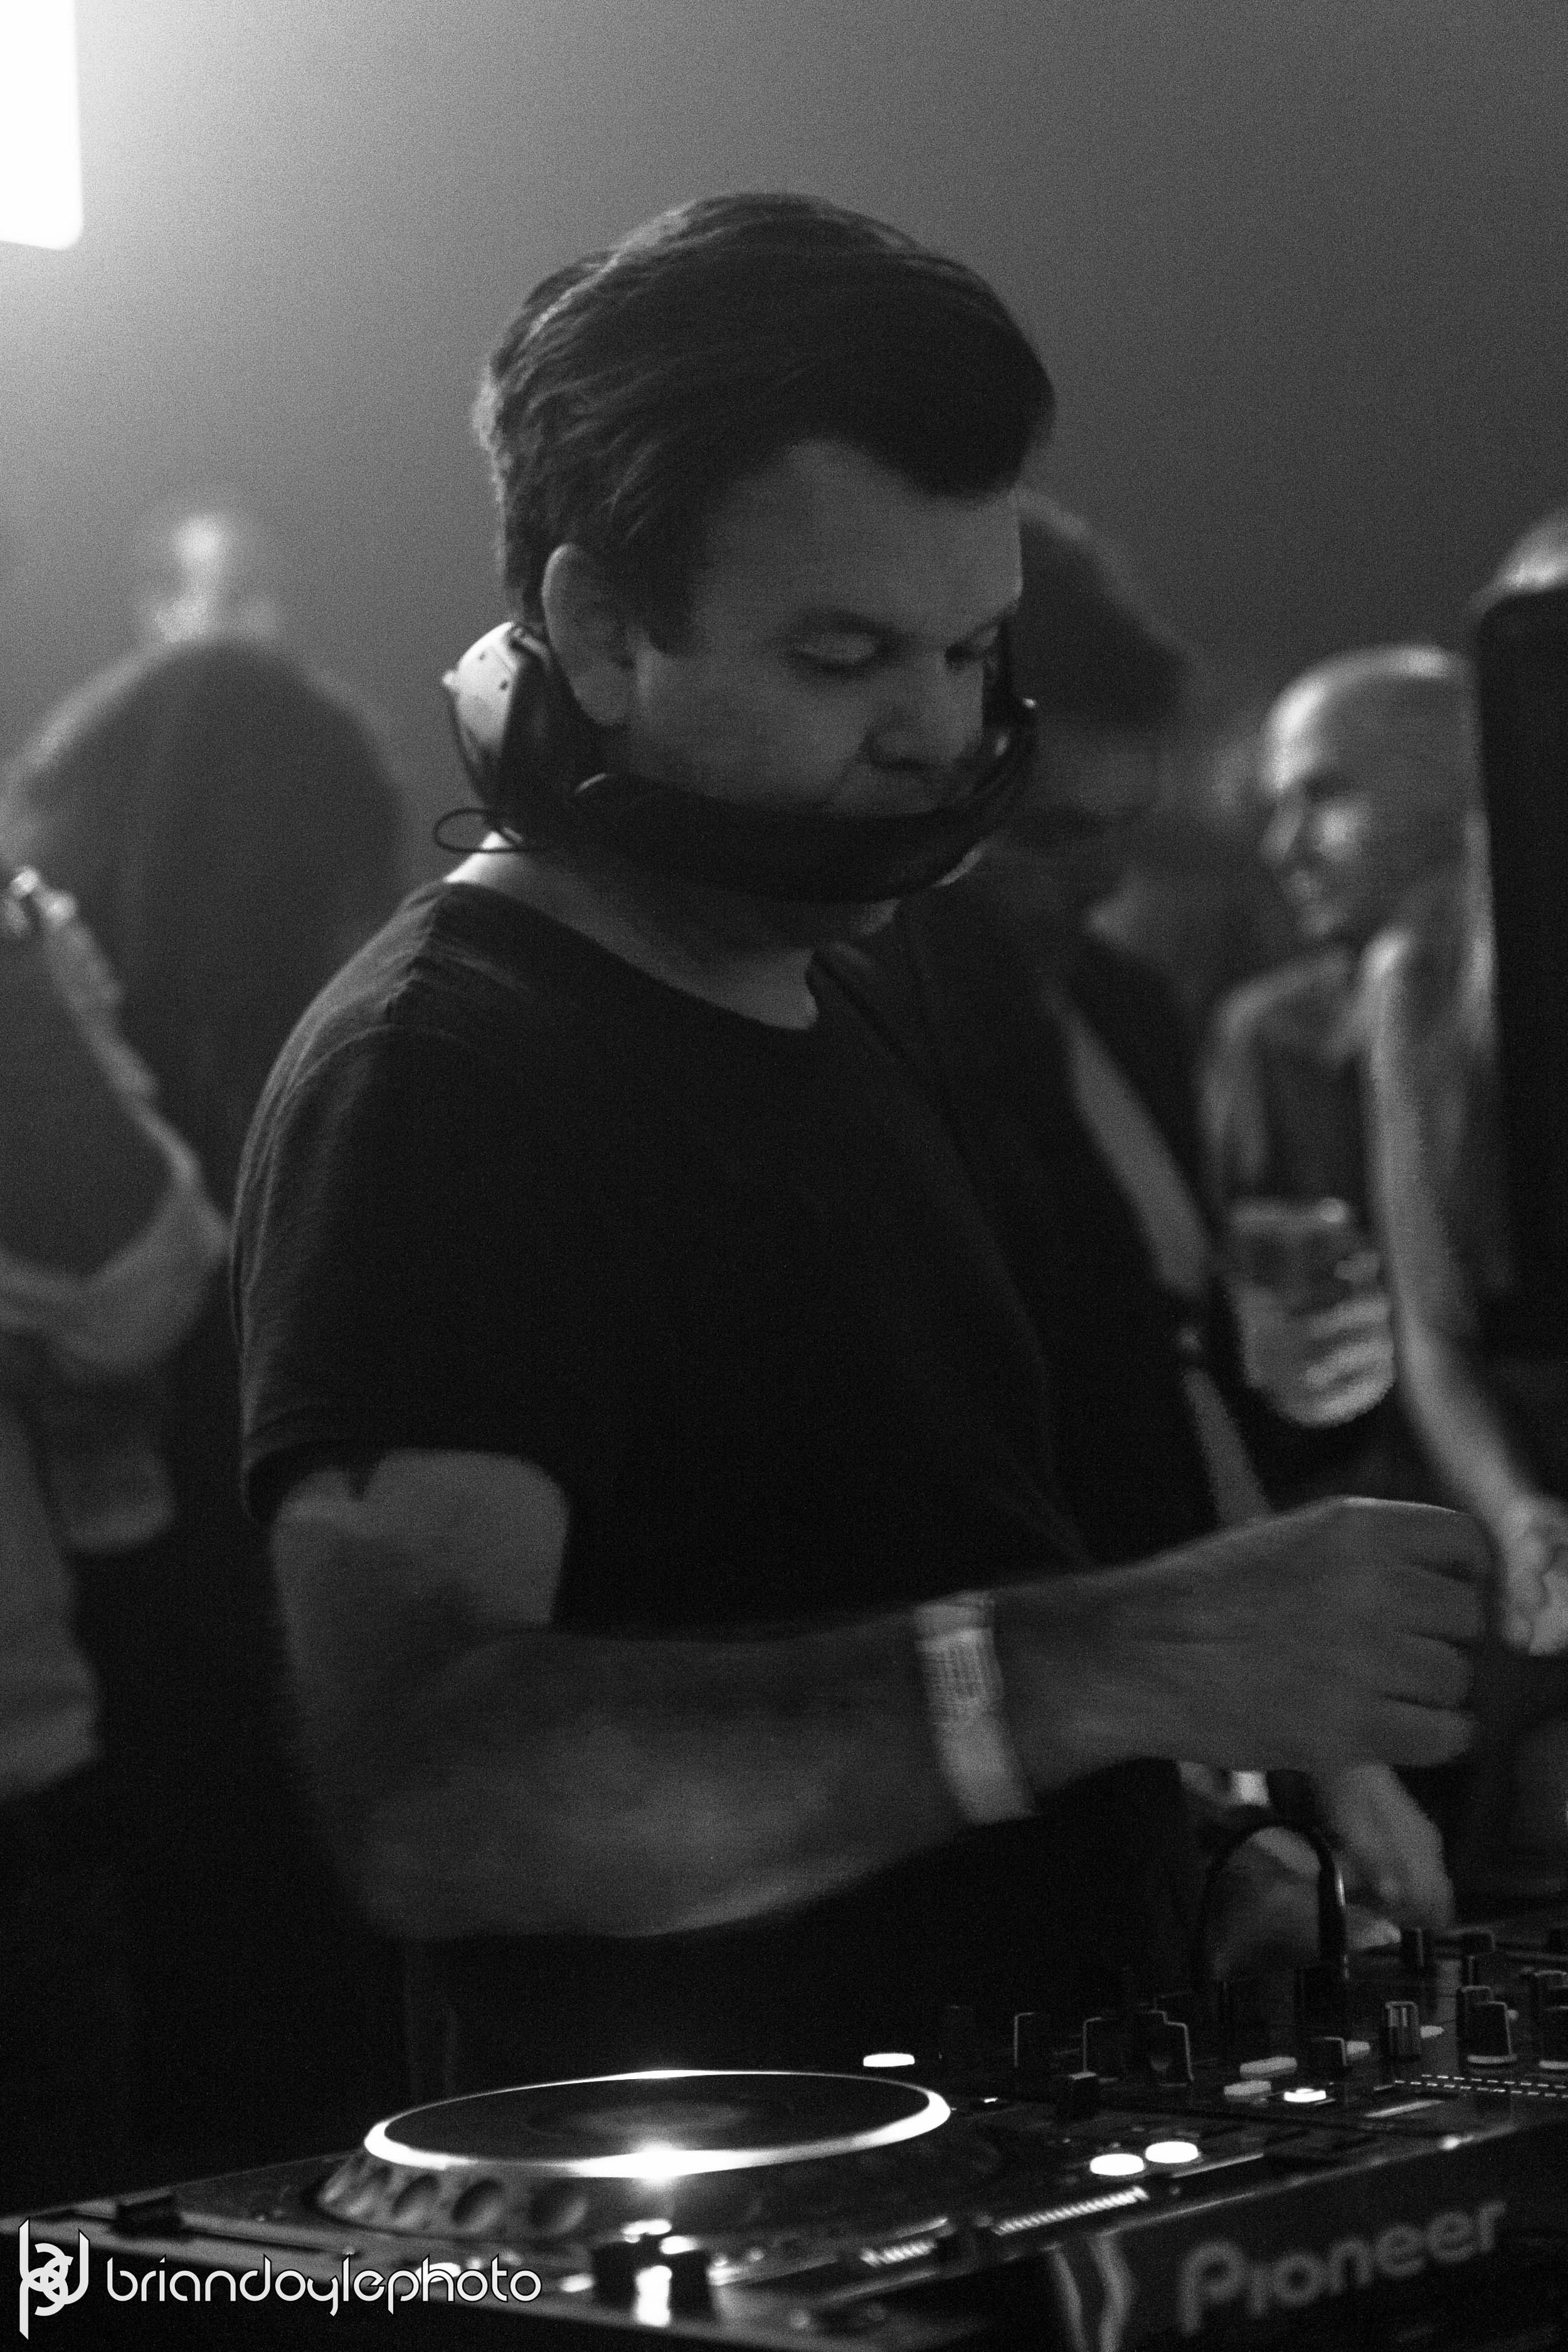 Jagermeister Presents - Paul Oakenfold @ Avalon bdp 27.09.14-48.jpg